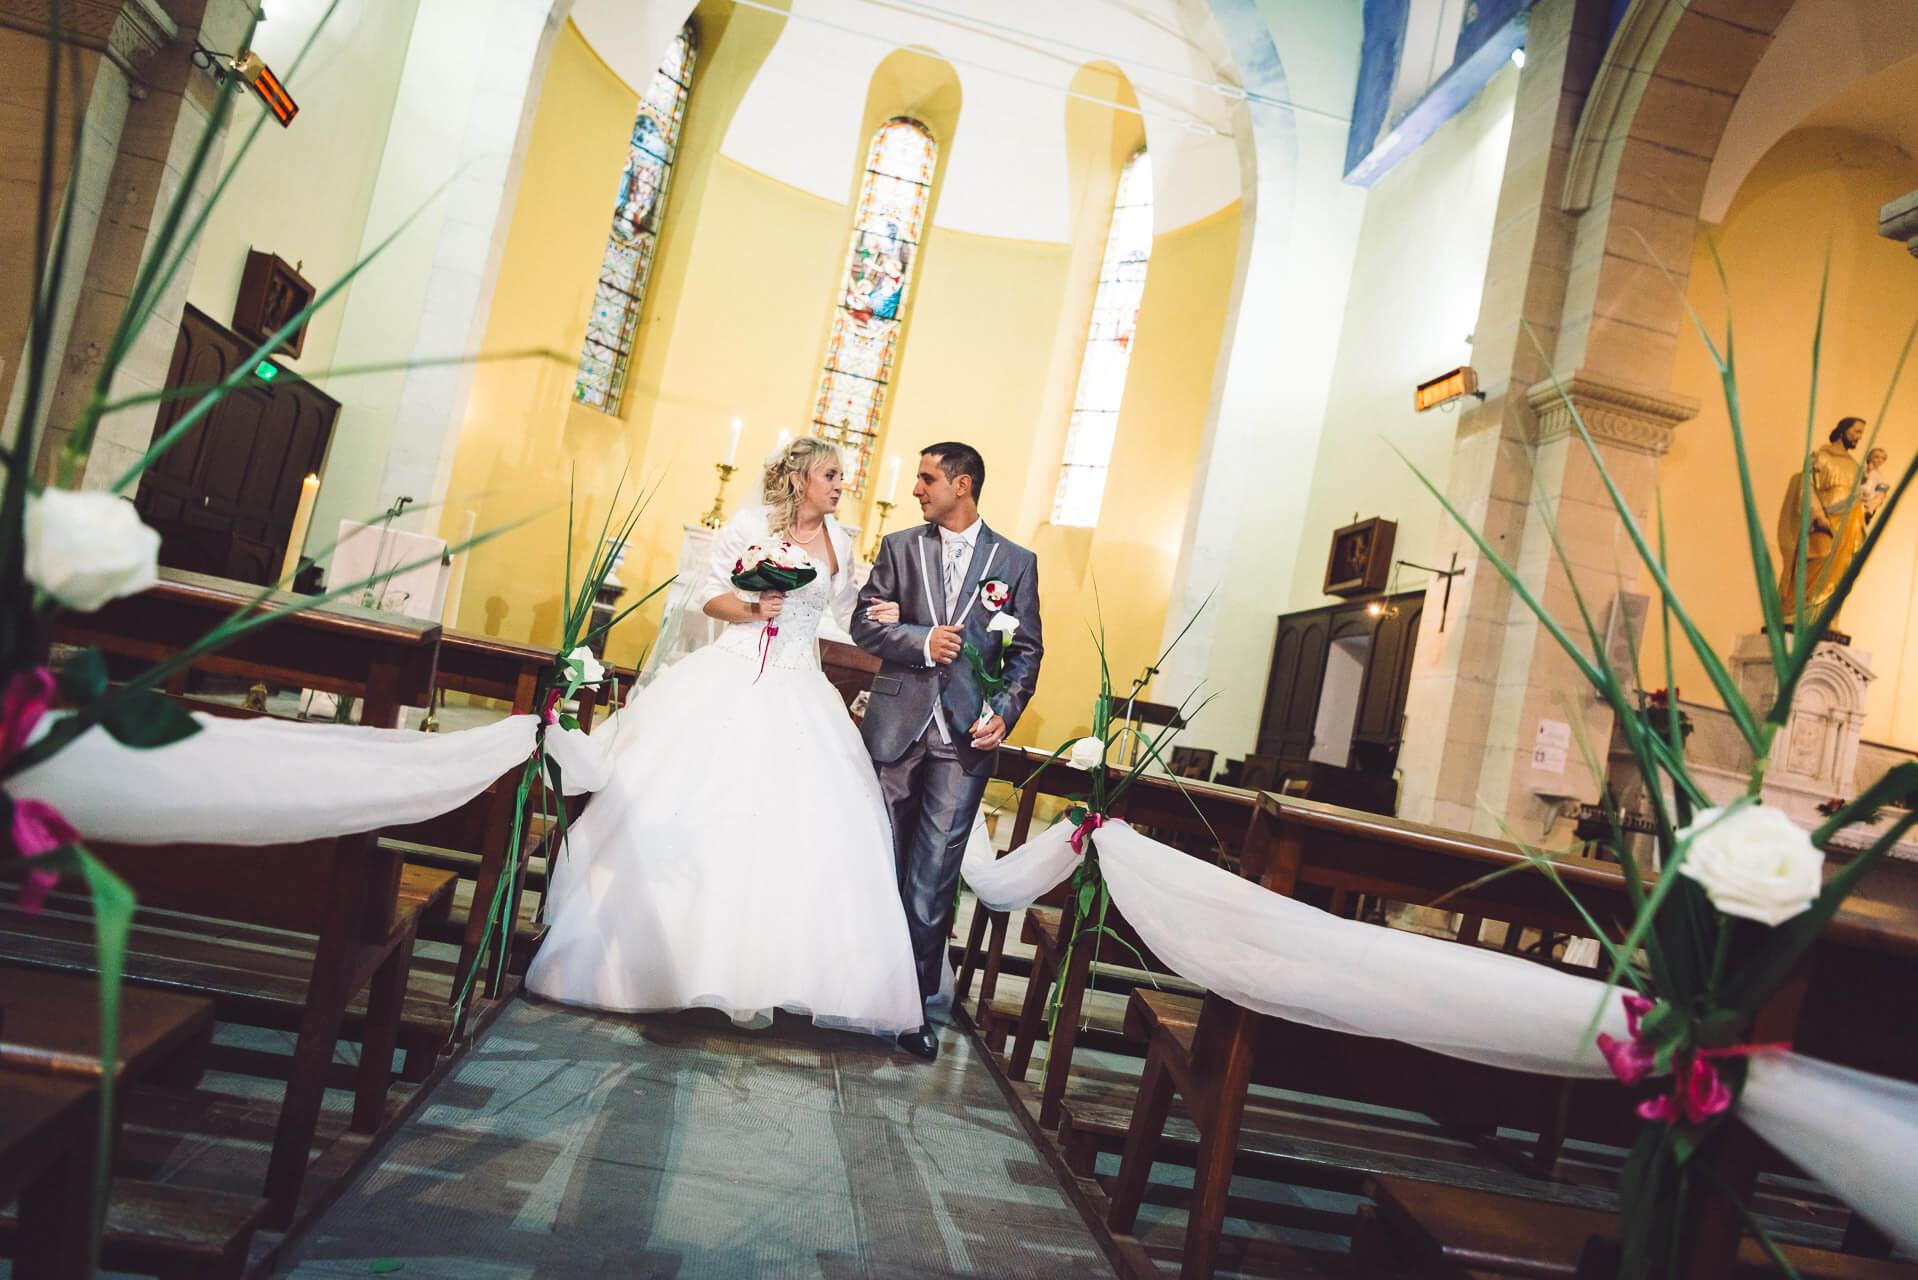 photographe mariage montady herault studio graou